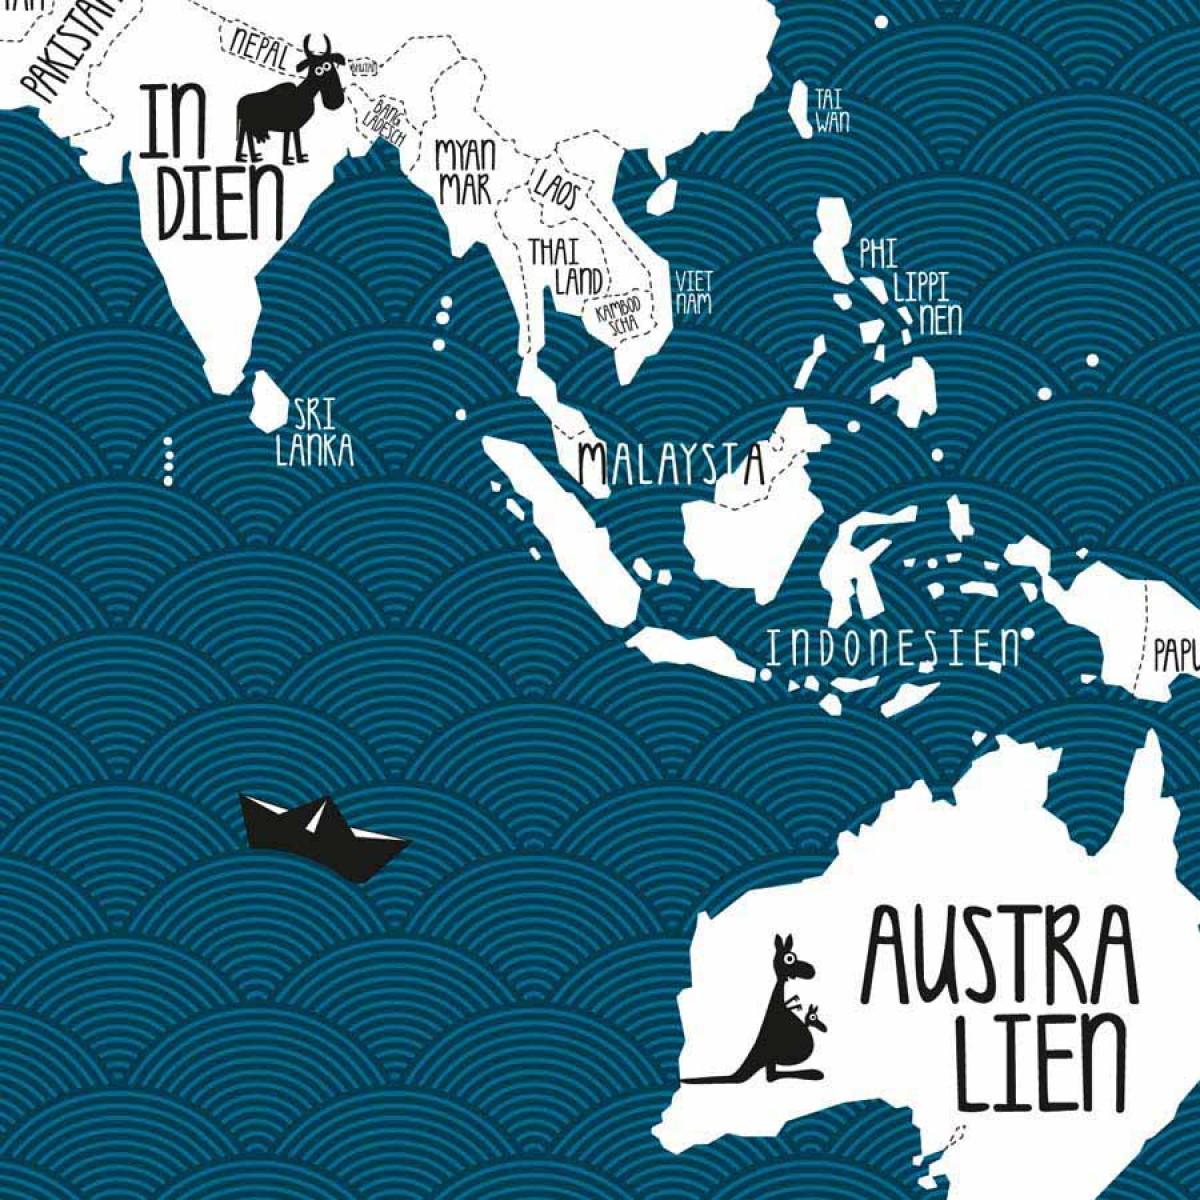 Amy & Kurt Berlin A0 Plakat Weltkarte petrol blau